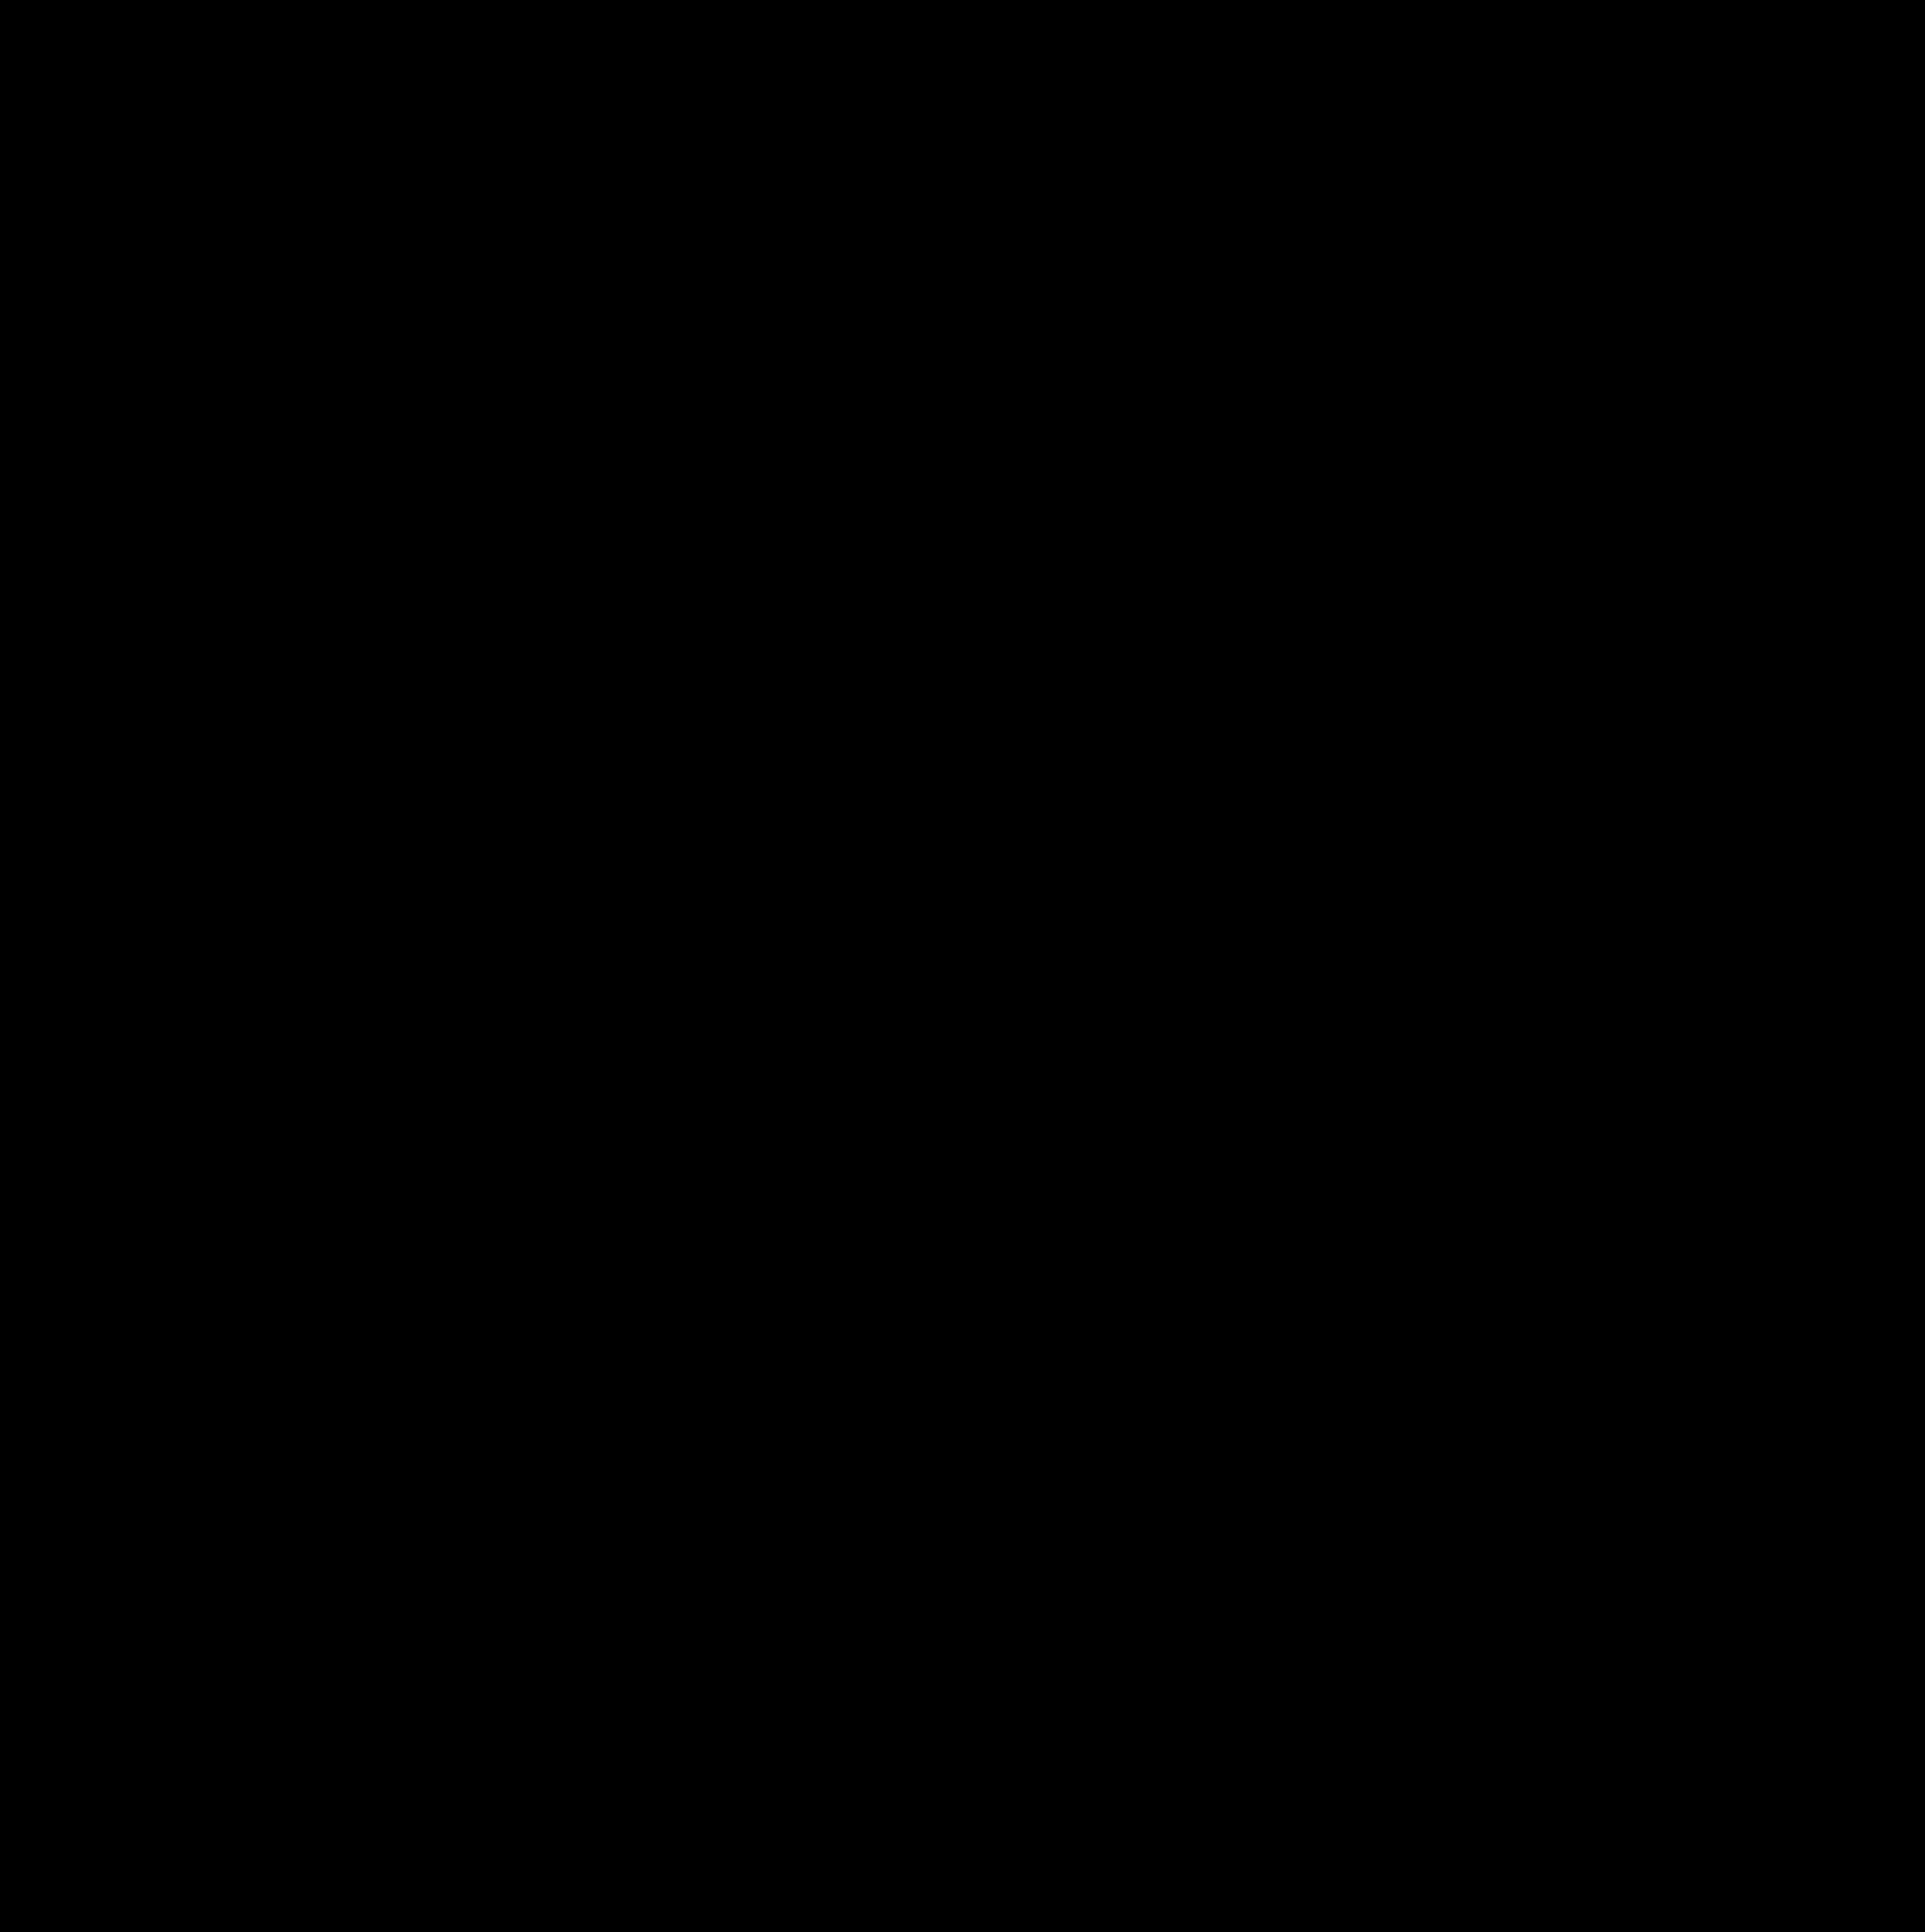 Rose clipart silhouette. Floral frame design no